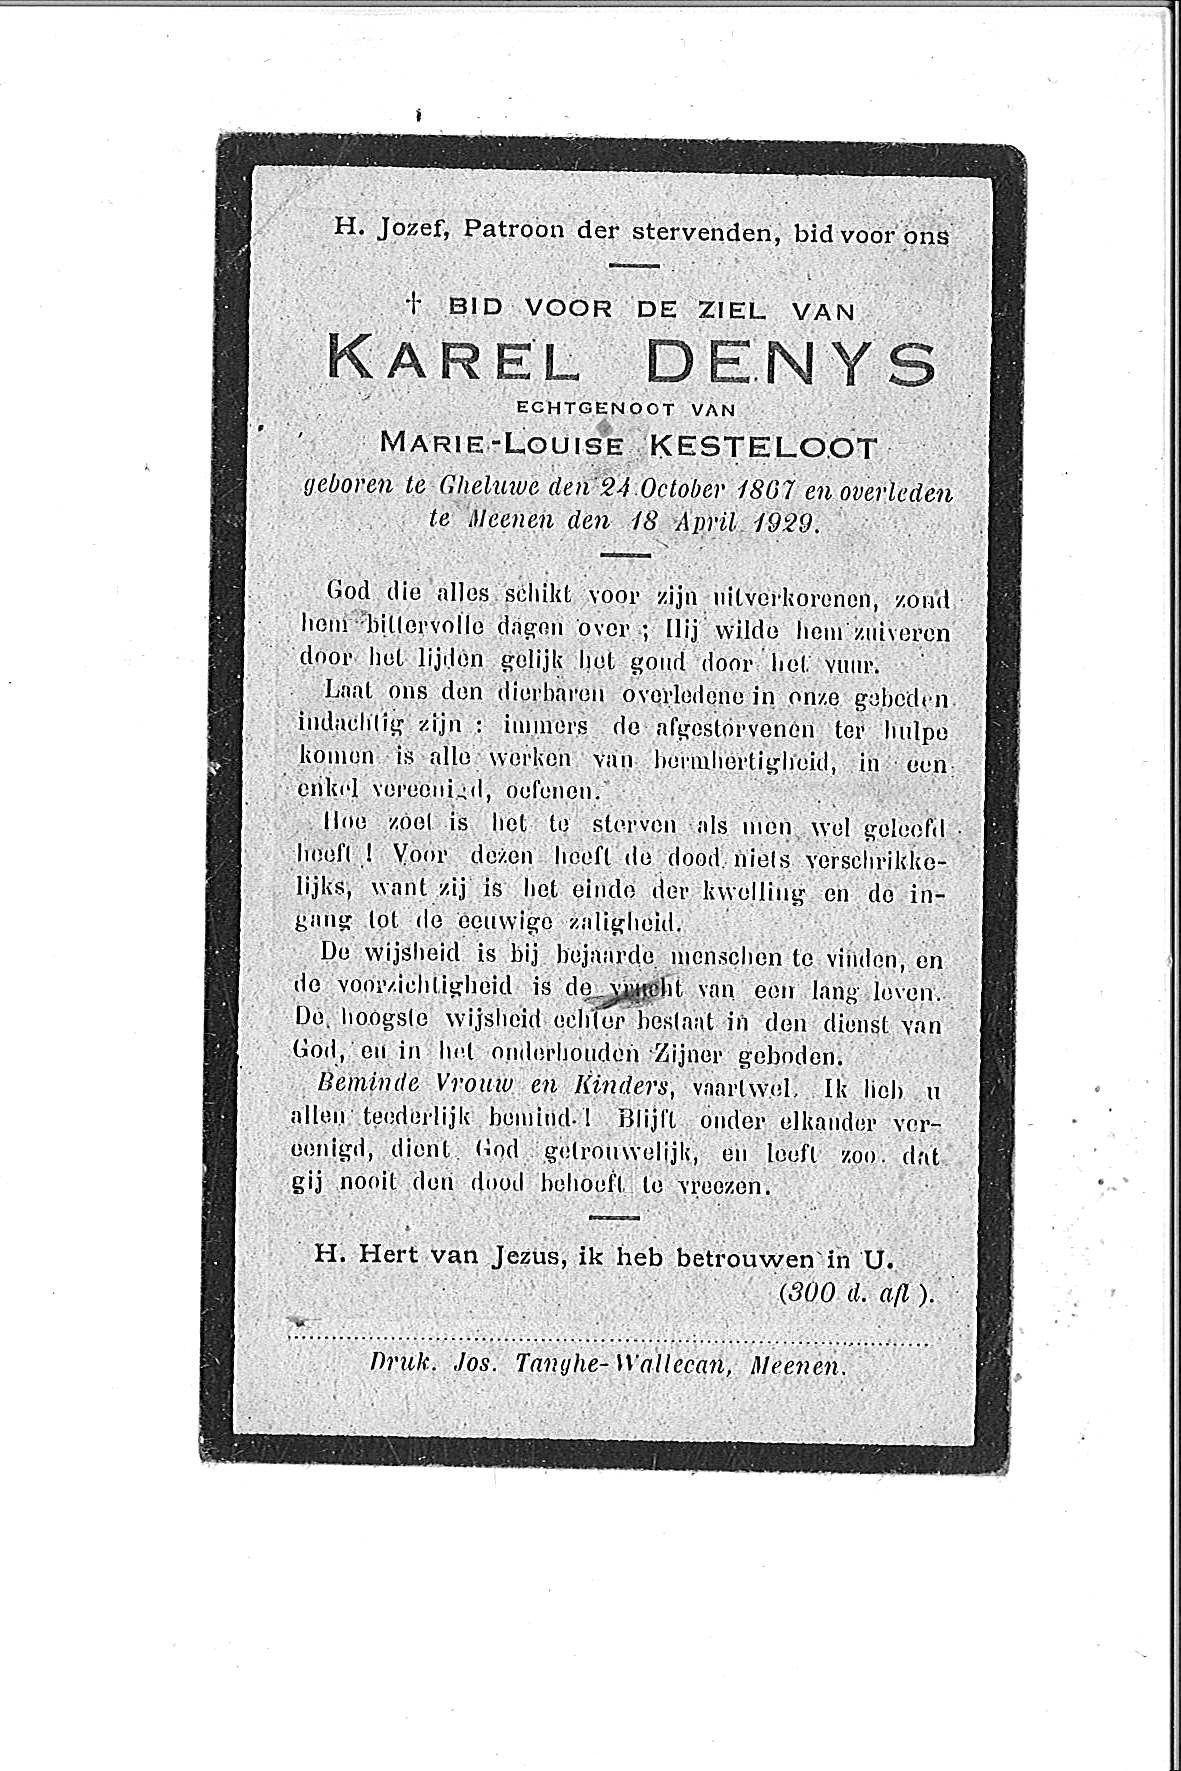 Karel(1929)20150415104000_00002.jpg